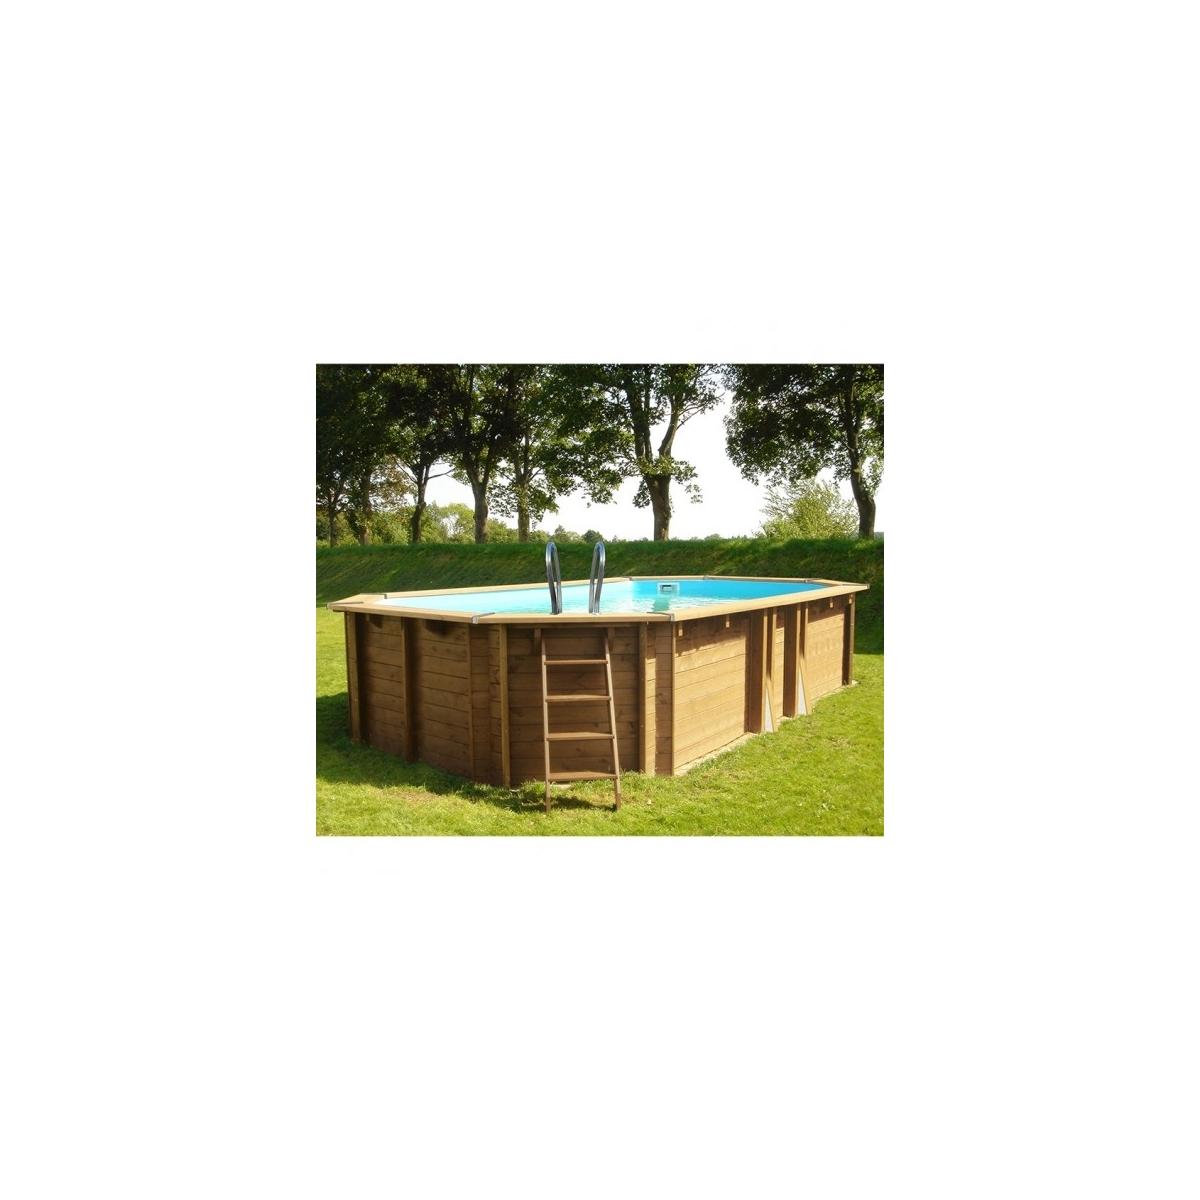 Piscina desmontable de madera Gre Sunbay Safran ovalada 637x412x133